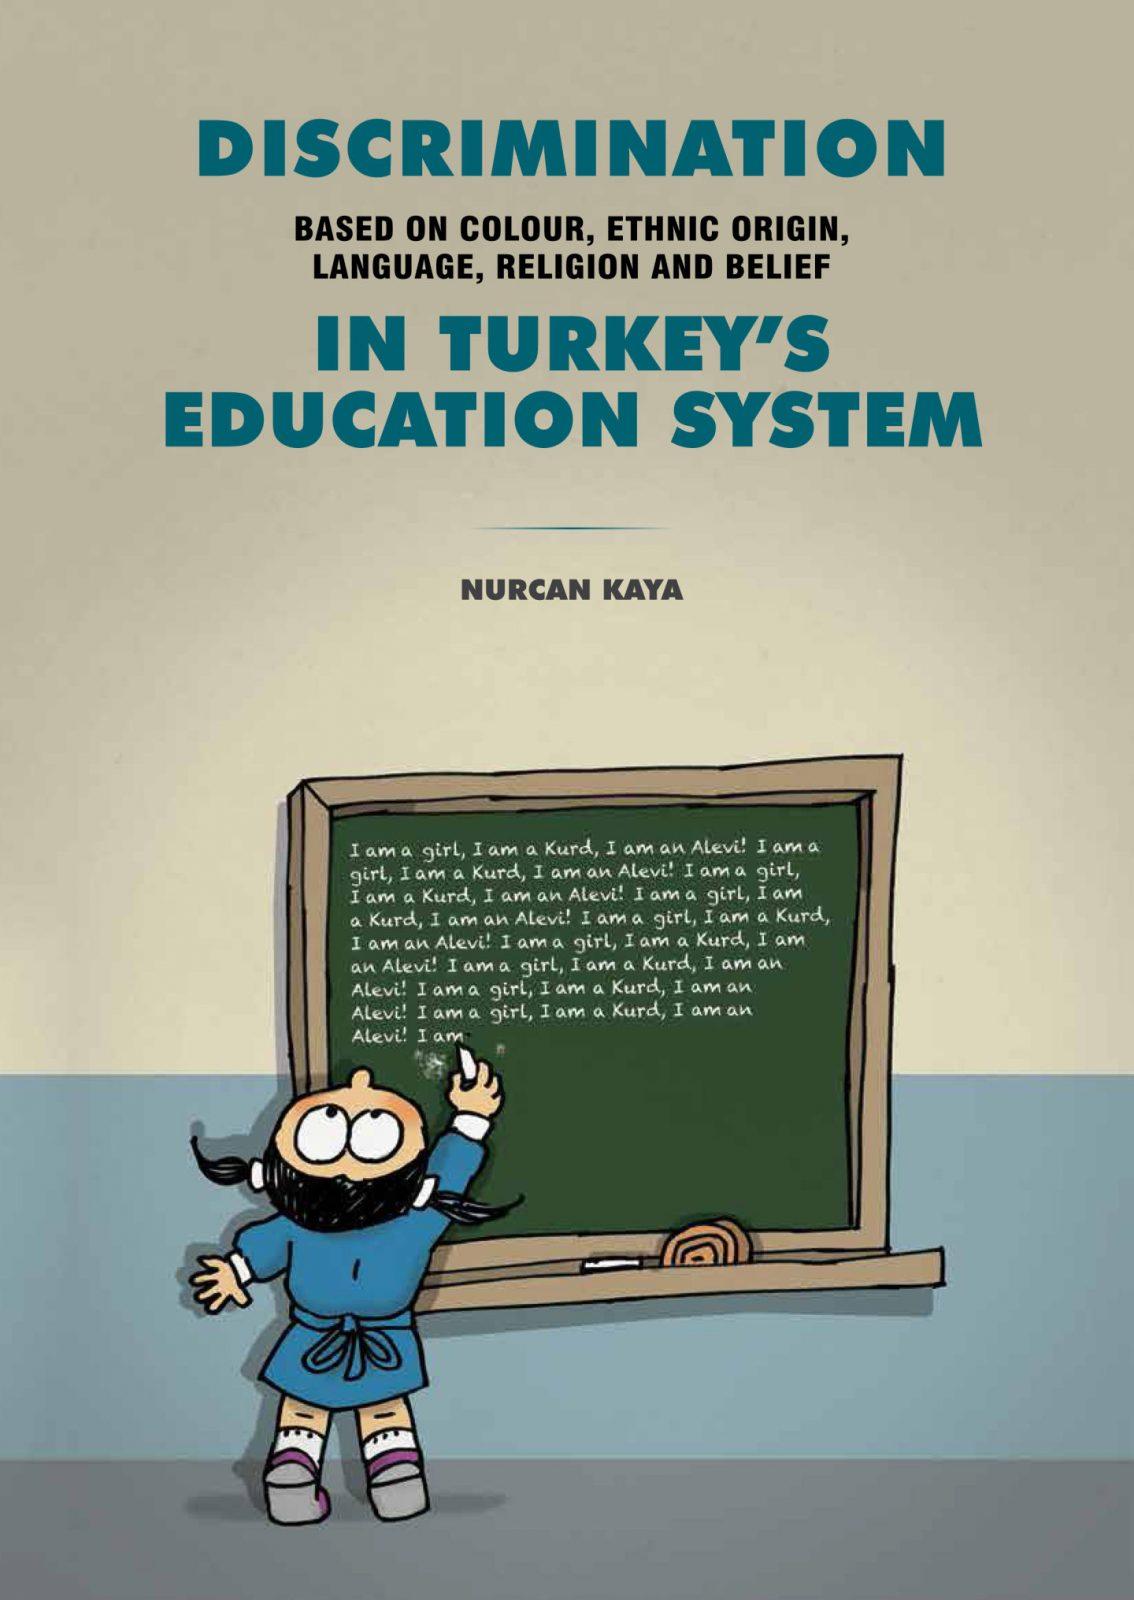 Educational System of Turkey